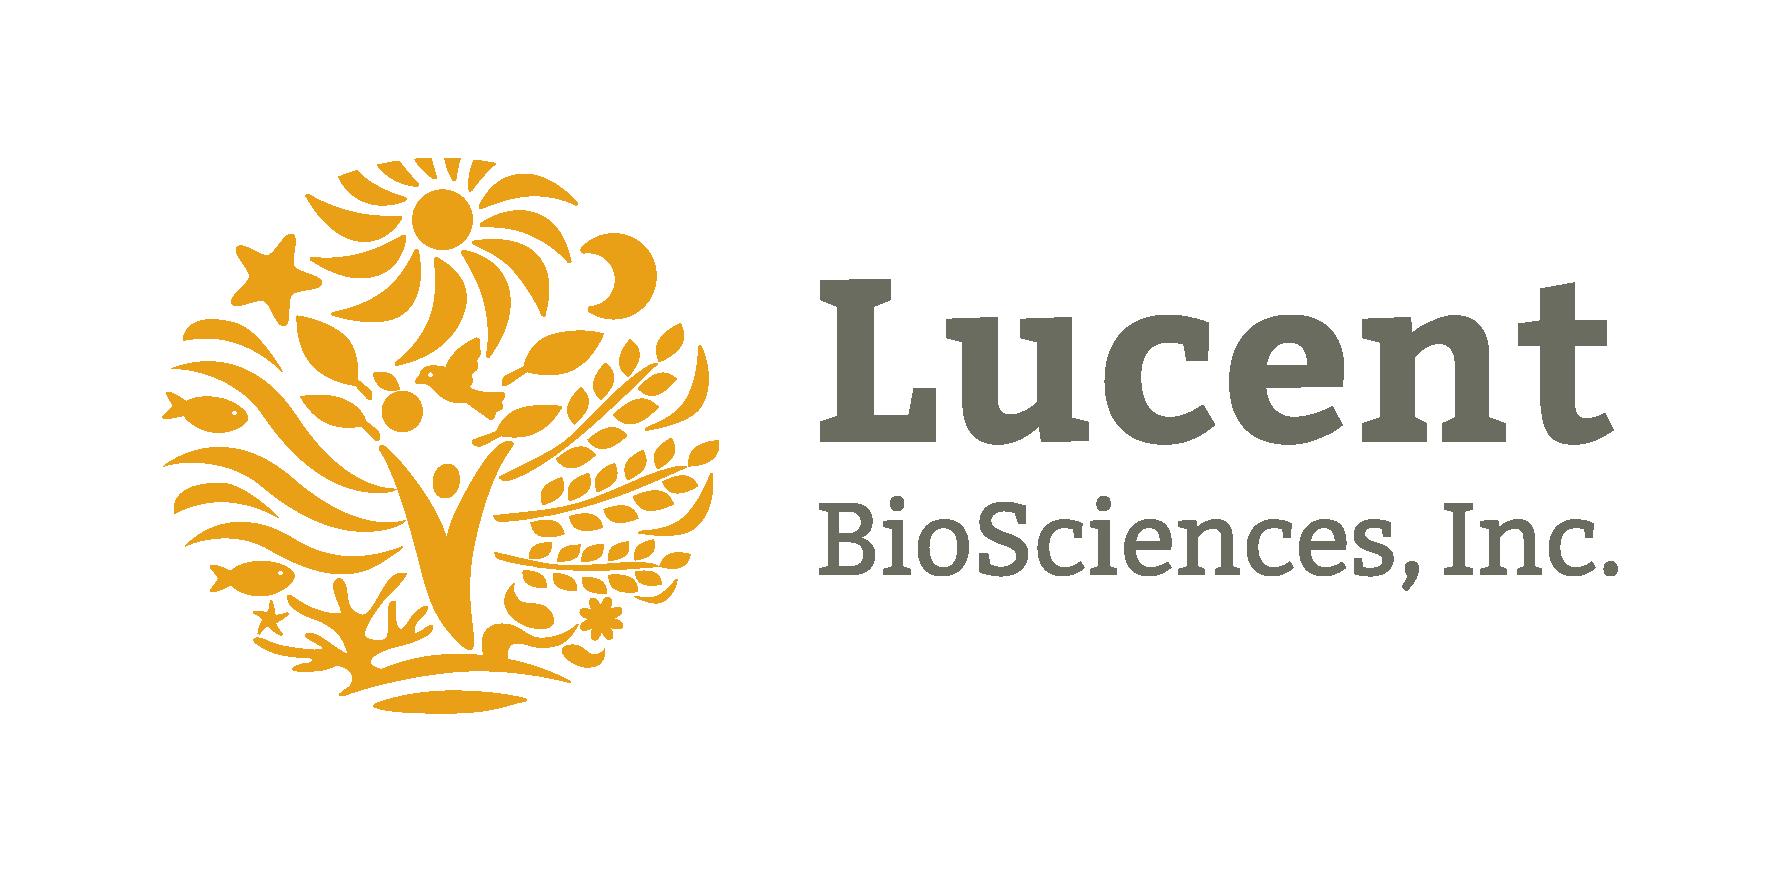 Lucent Biosciences, Inc.